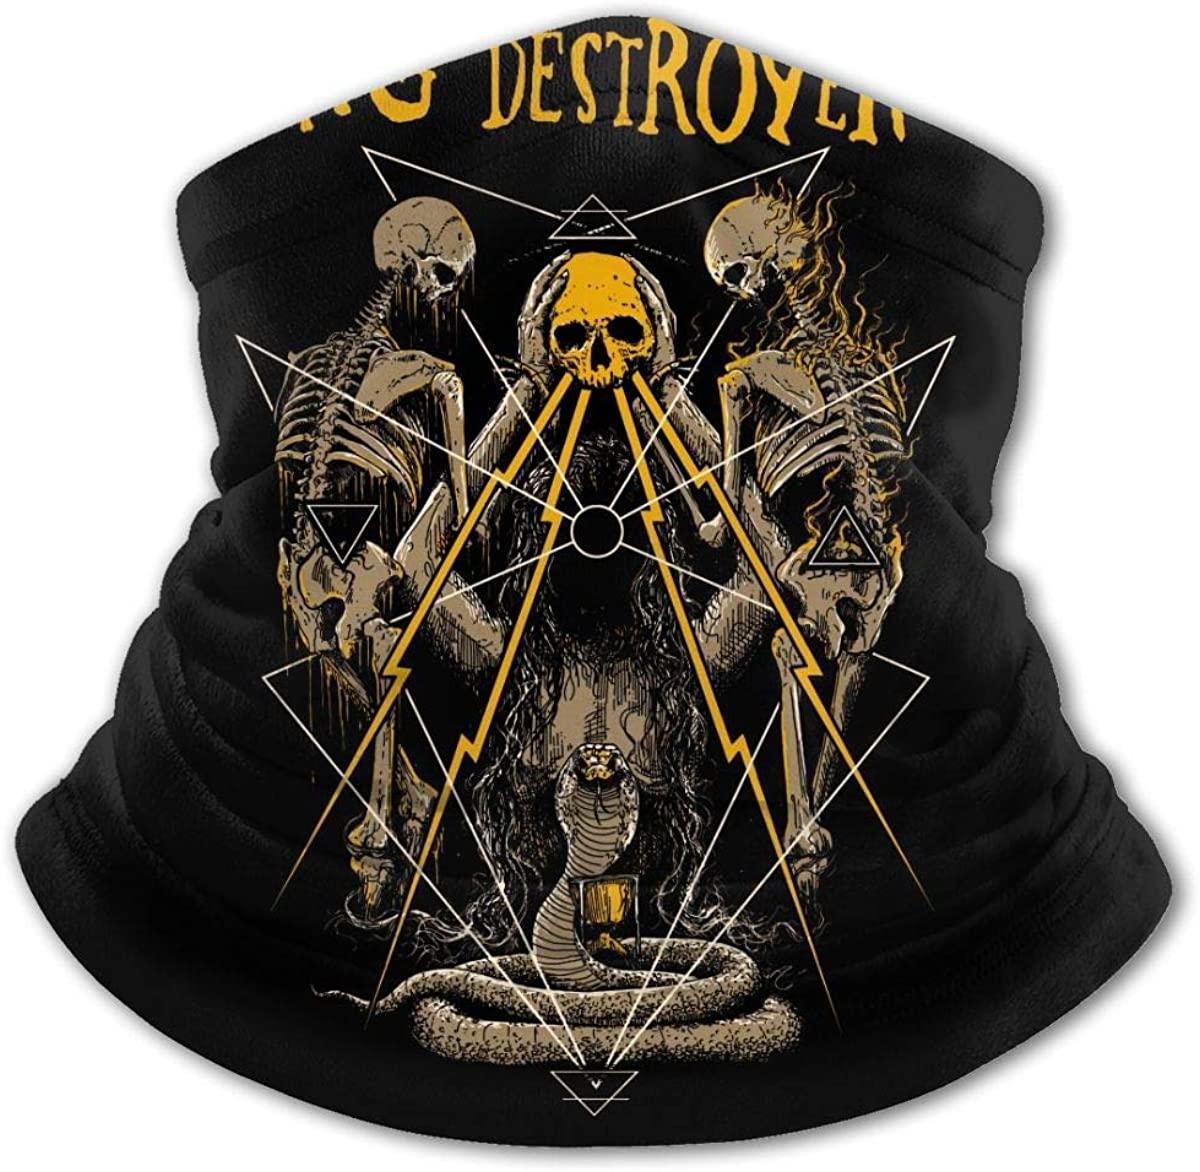 Pig Destroyer Face Mask Balaclava Protection from Dust, Uv & Aerosols - Reusable Bandana Face Cover Black